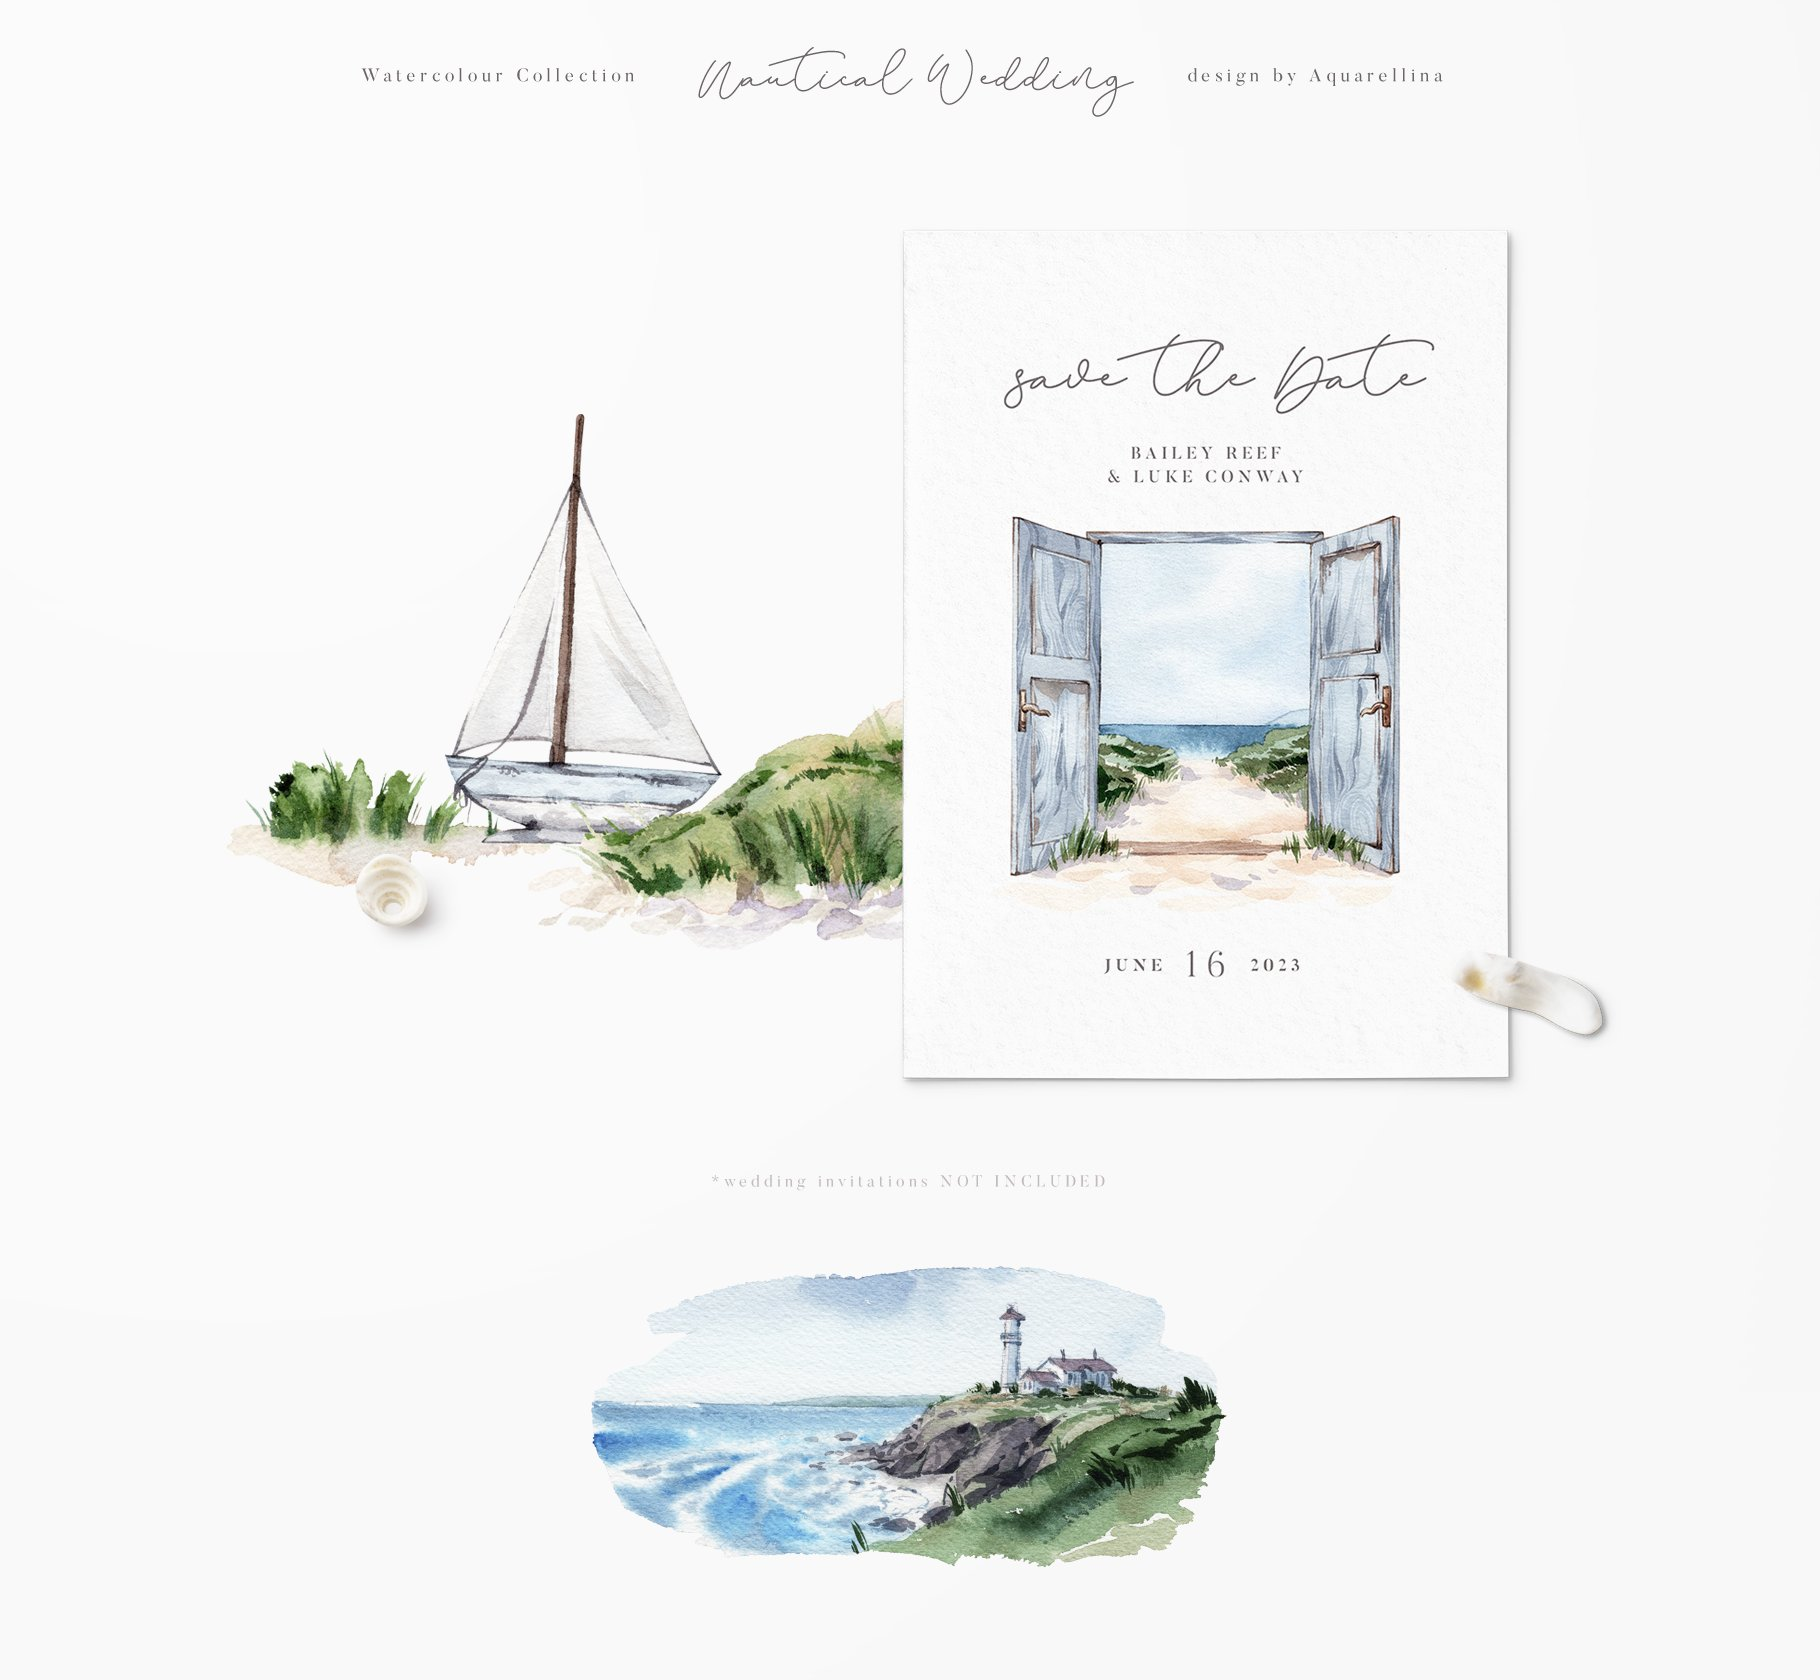 nautical beach wedding illustrations by aquarellina screenshot 24 9